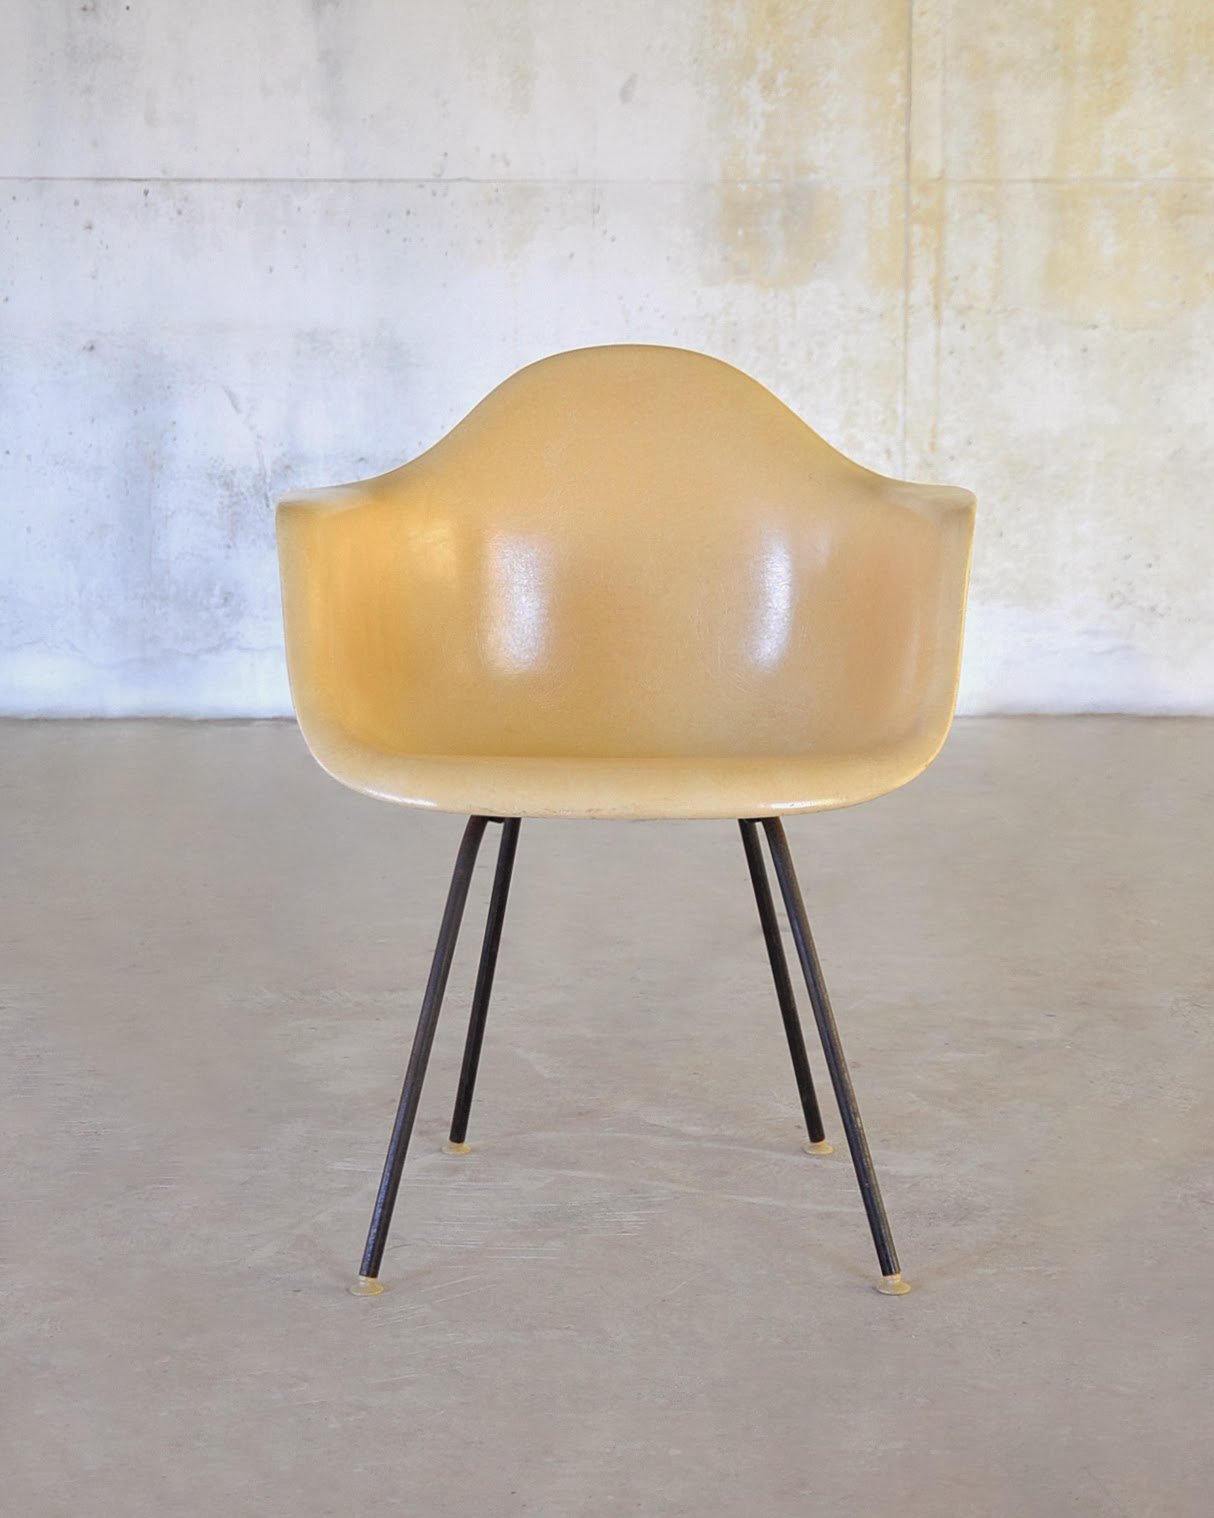 Shell Chair Knock Off Chaise Lounger Select Modern Eames Fiberglass